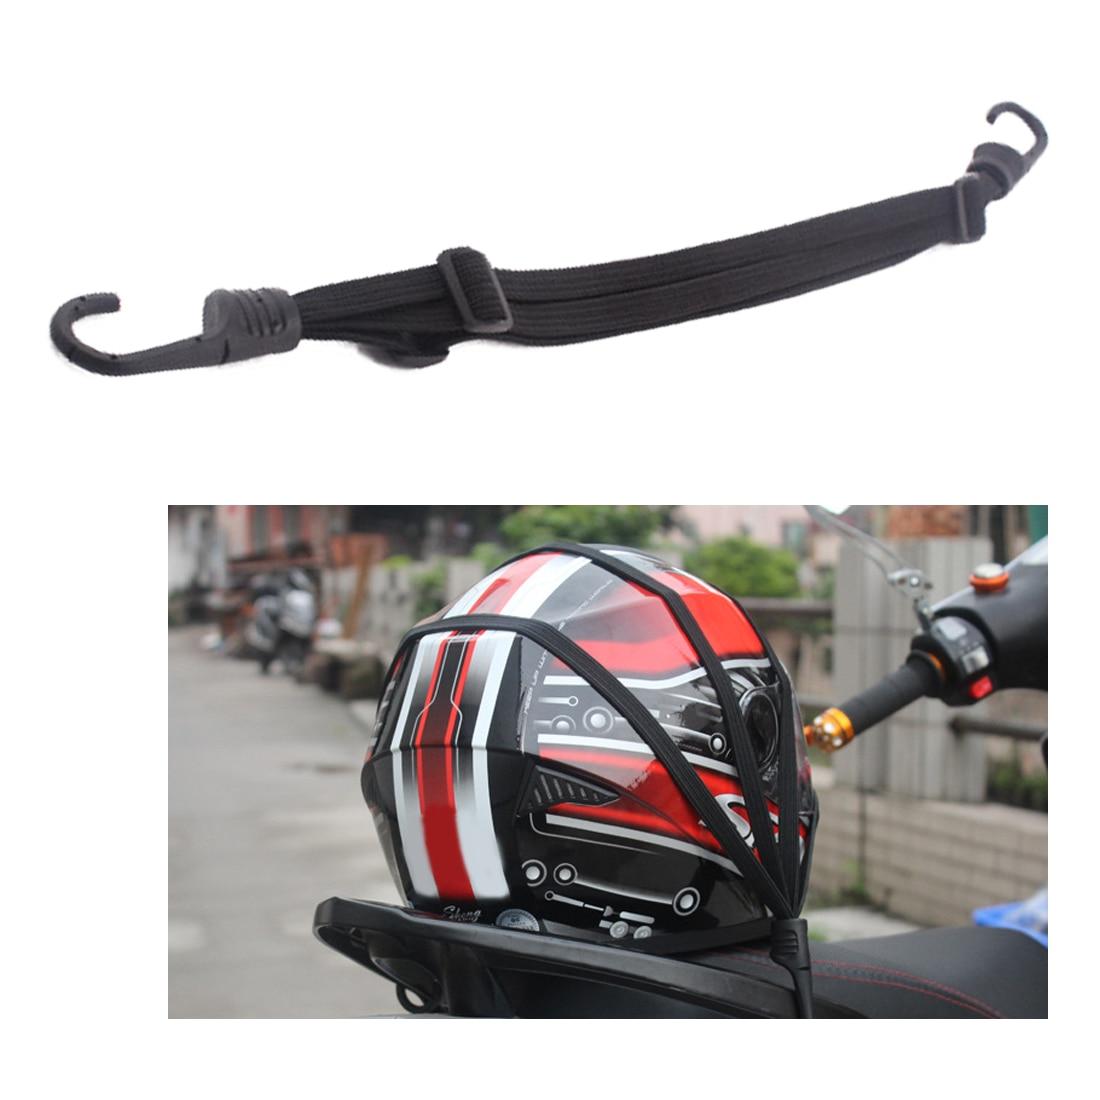 Dewtreetali Good sale 2 Hooks Motorcycles Strength Retractable Helmet Luggage Elastic Rope Strap